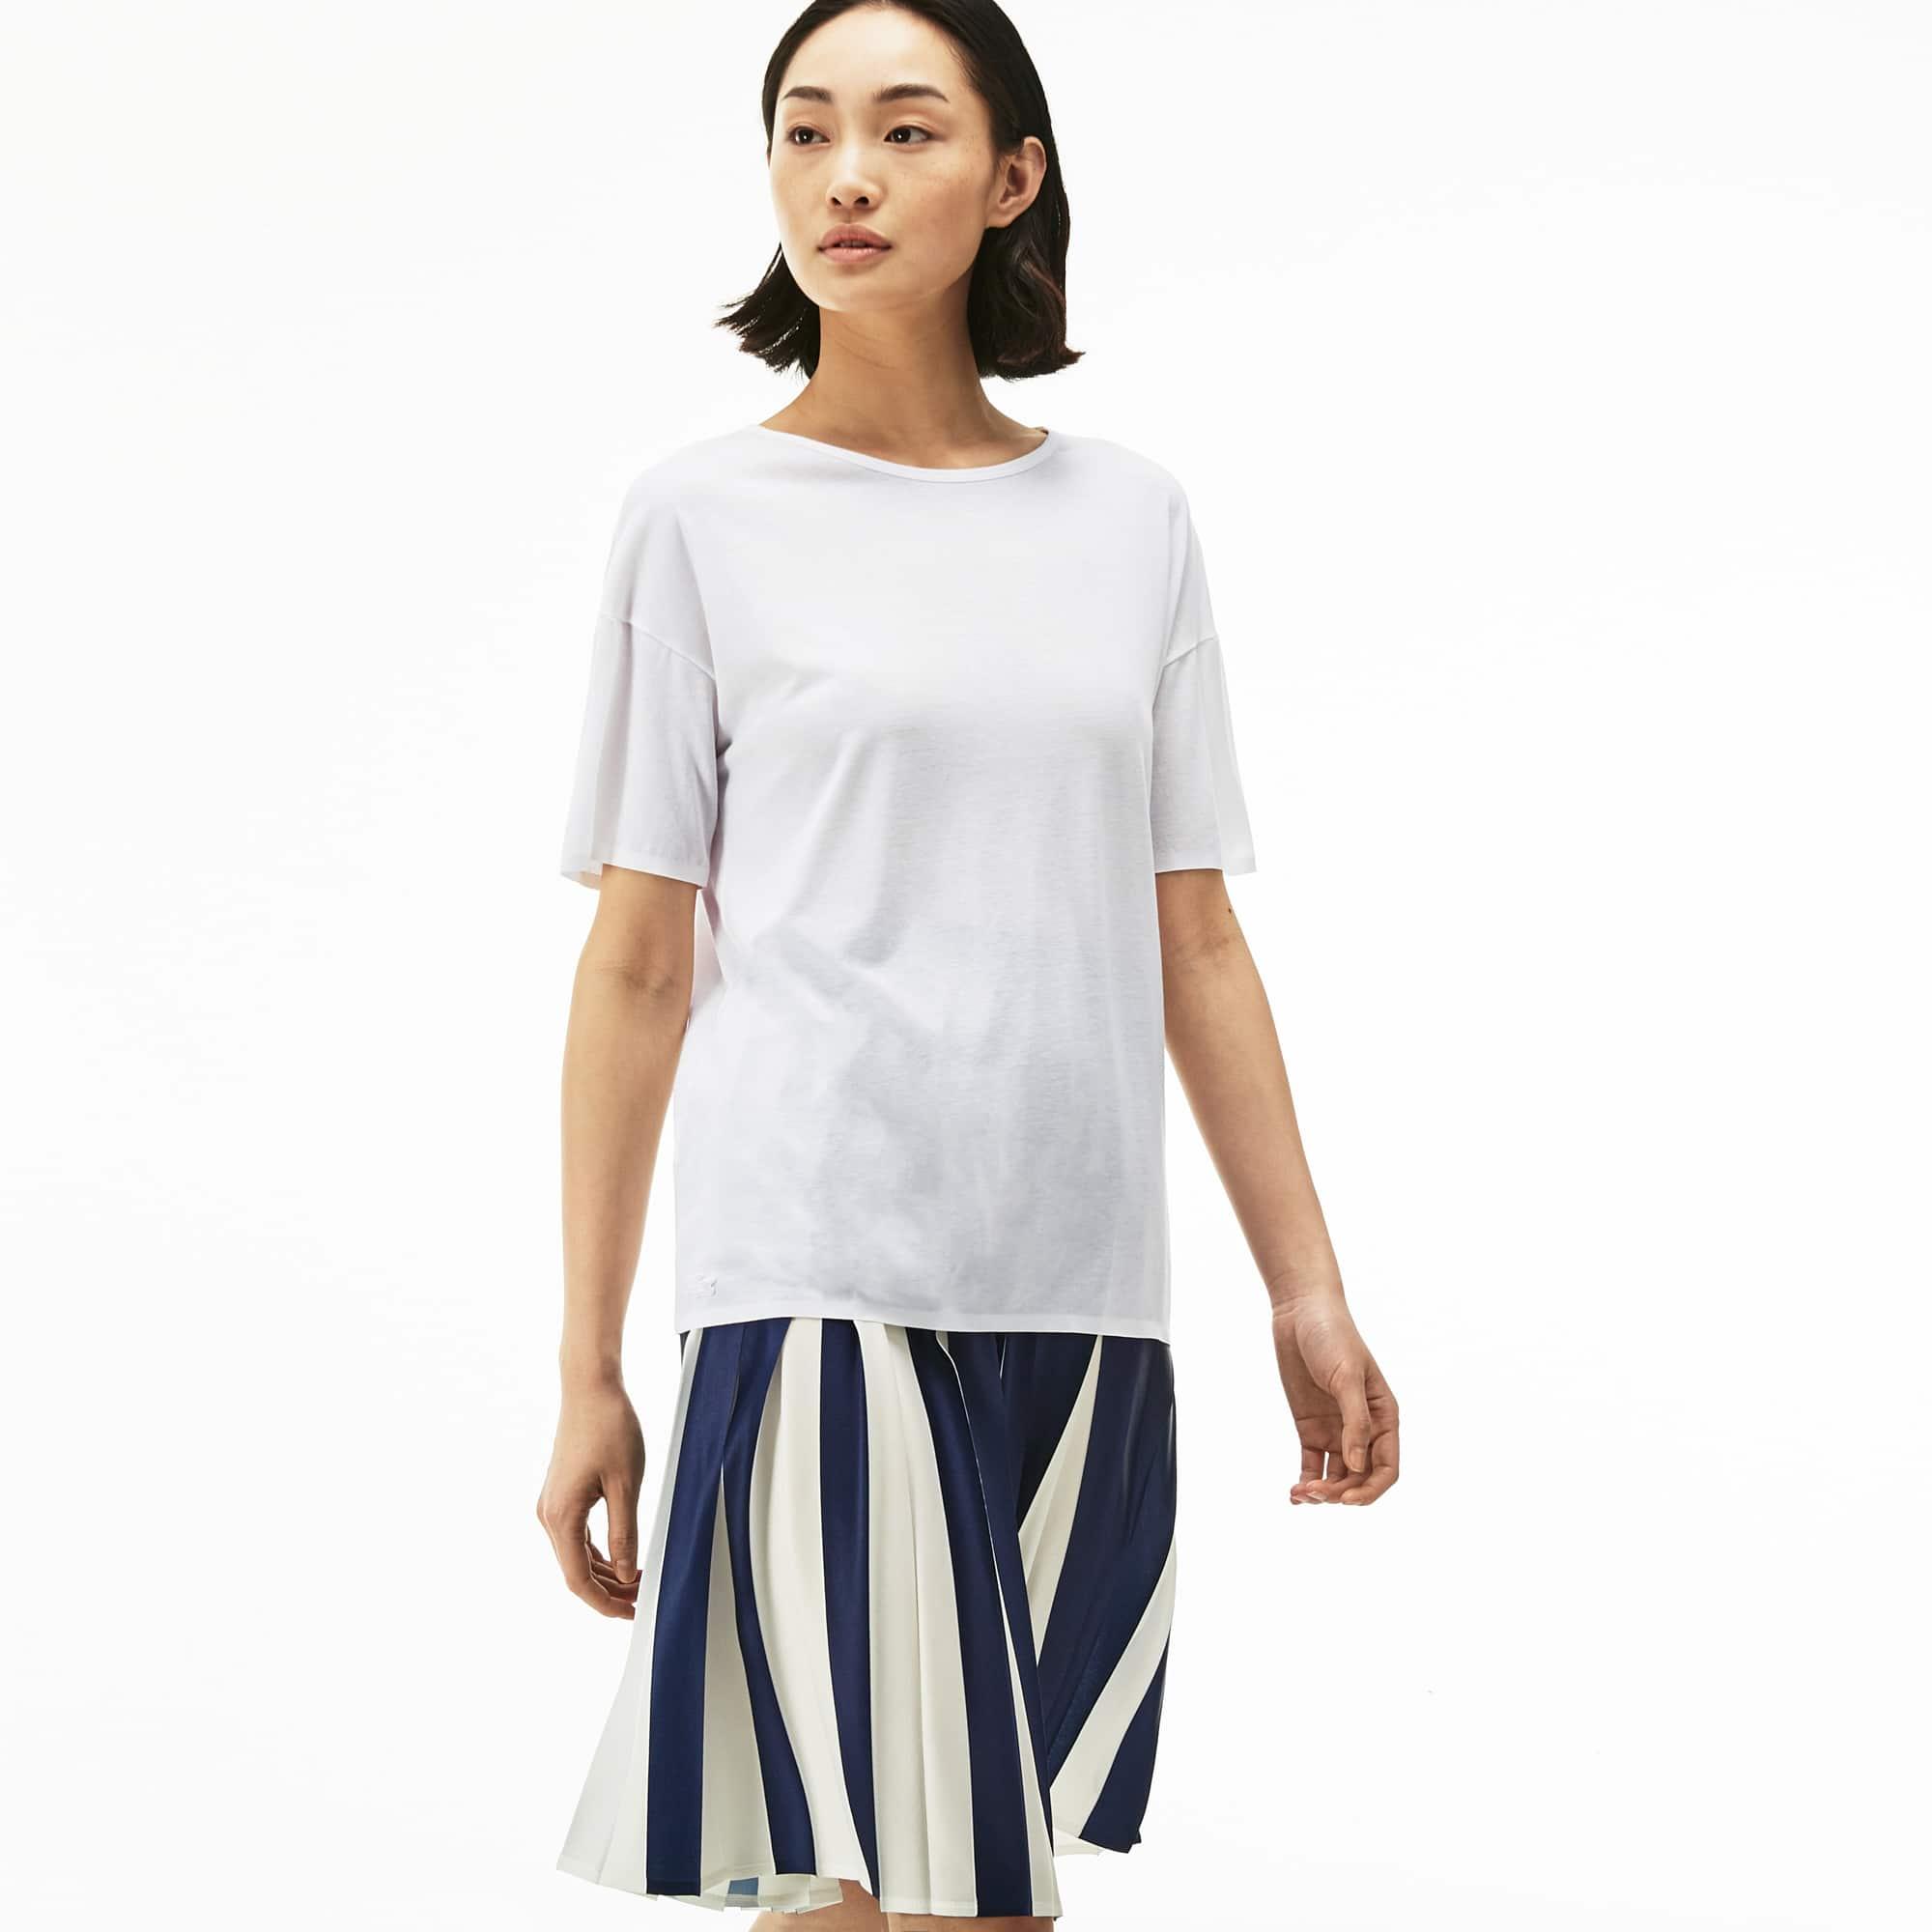 Women 39 S T Shirts Lacoste T Shirts For Women Lacoste